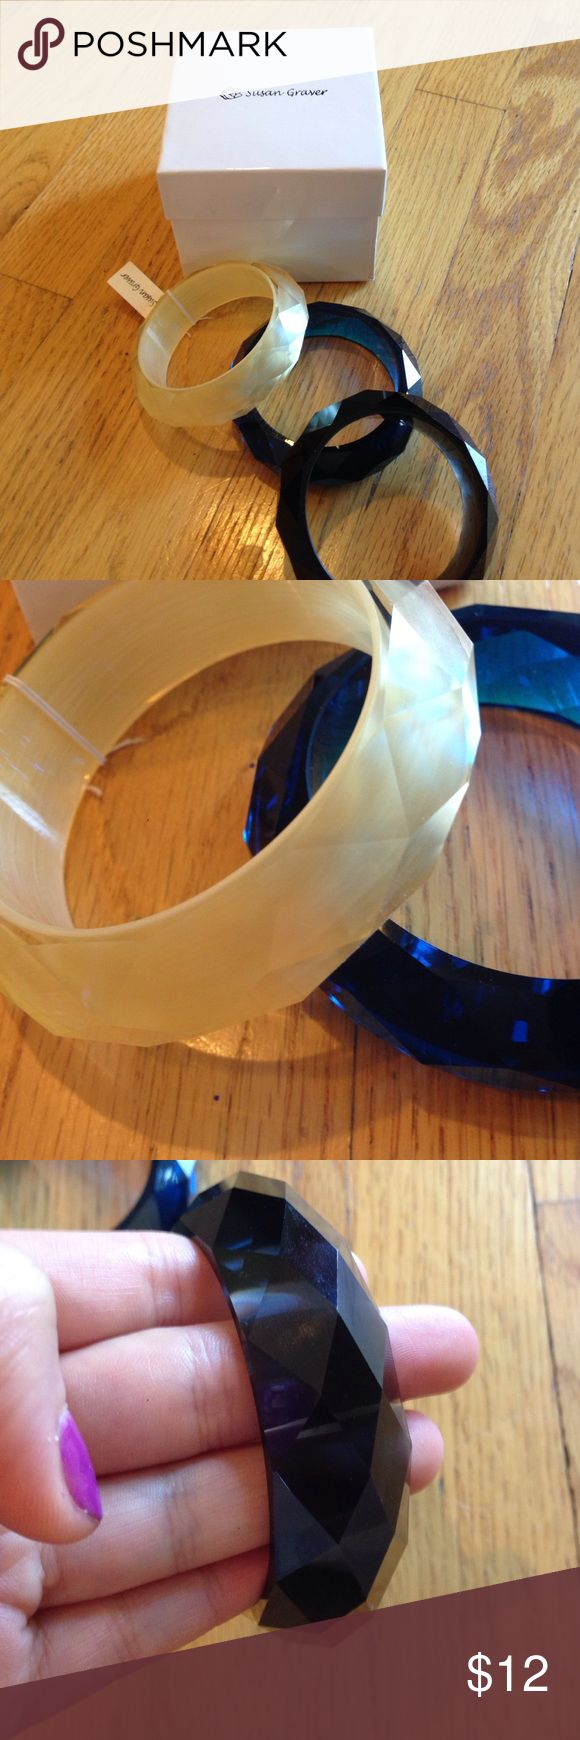 3 Piece Bracelet Set by Susan Graver Three piece chunky bracelet set by Susan Graver. Colors include white/opal, navy, and black. Susan Graver Jewelry Bracelets